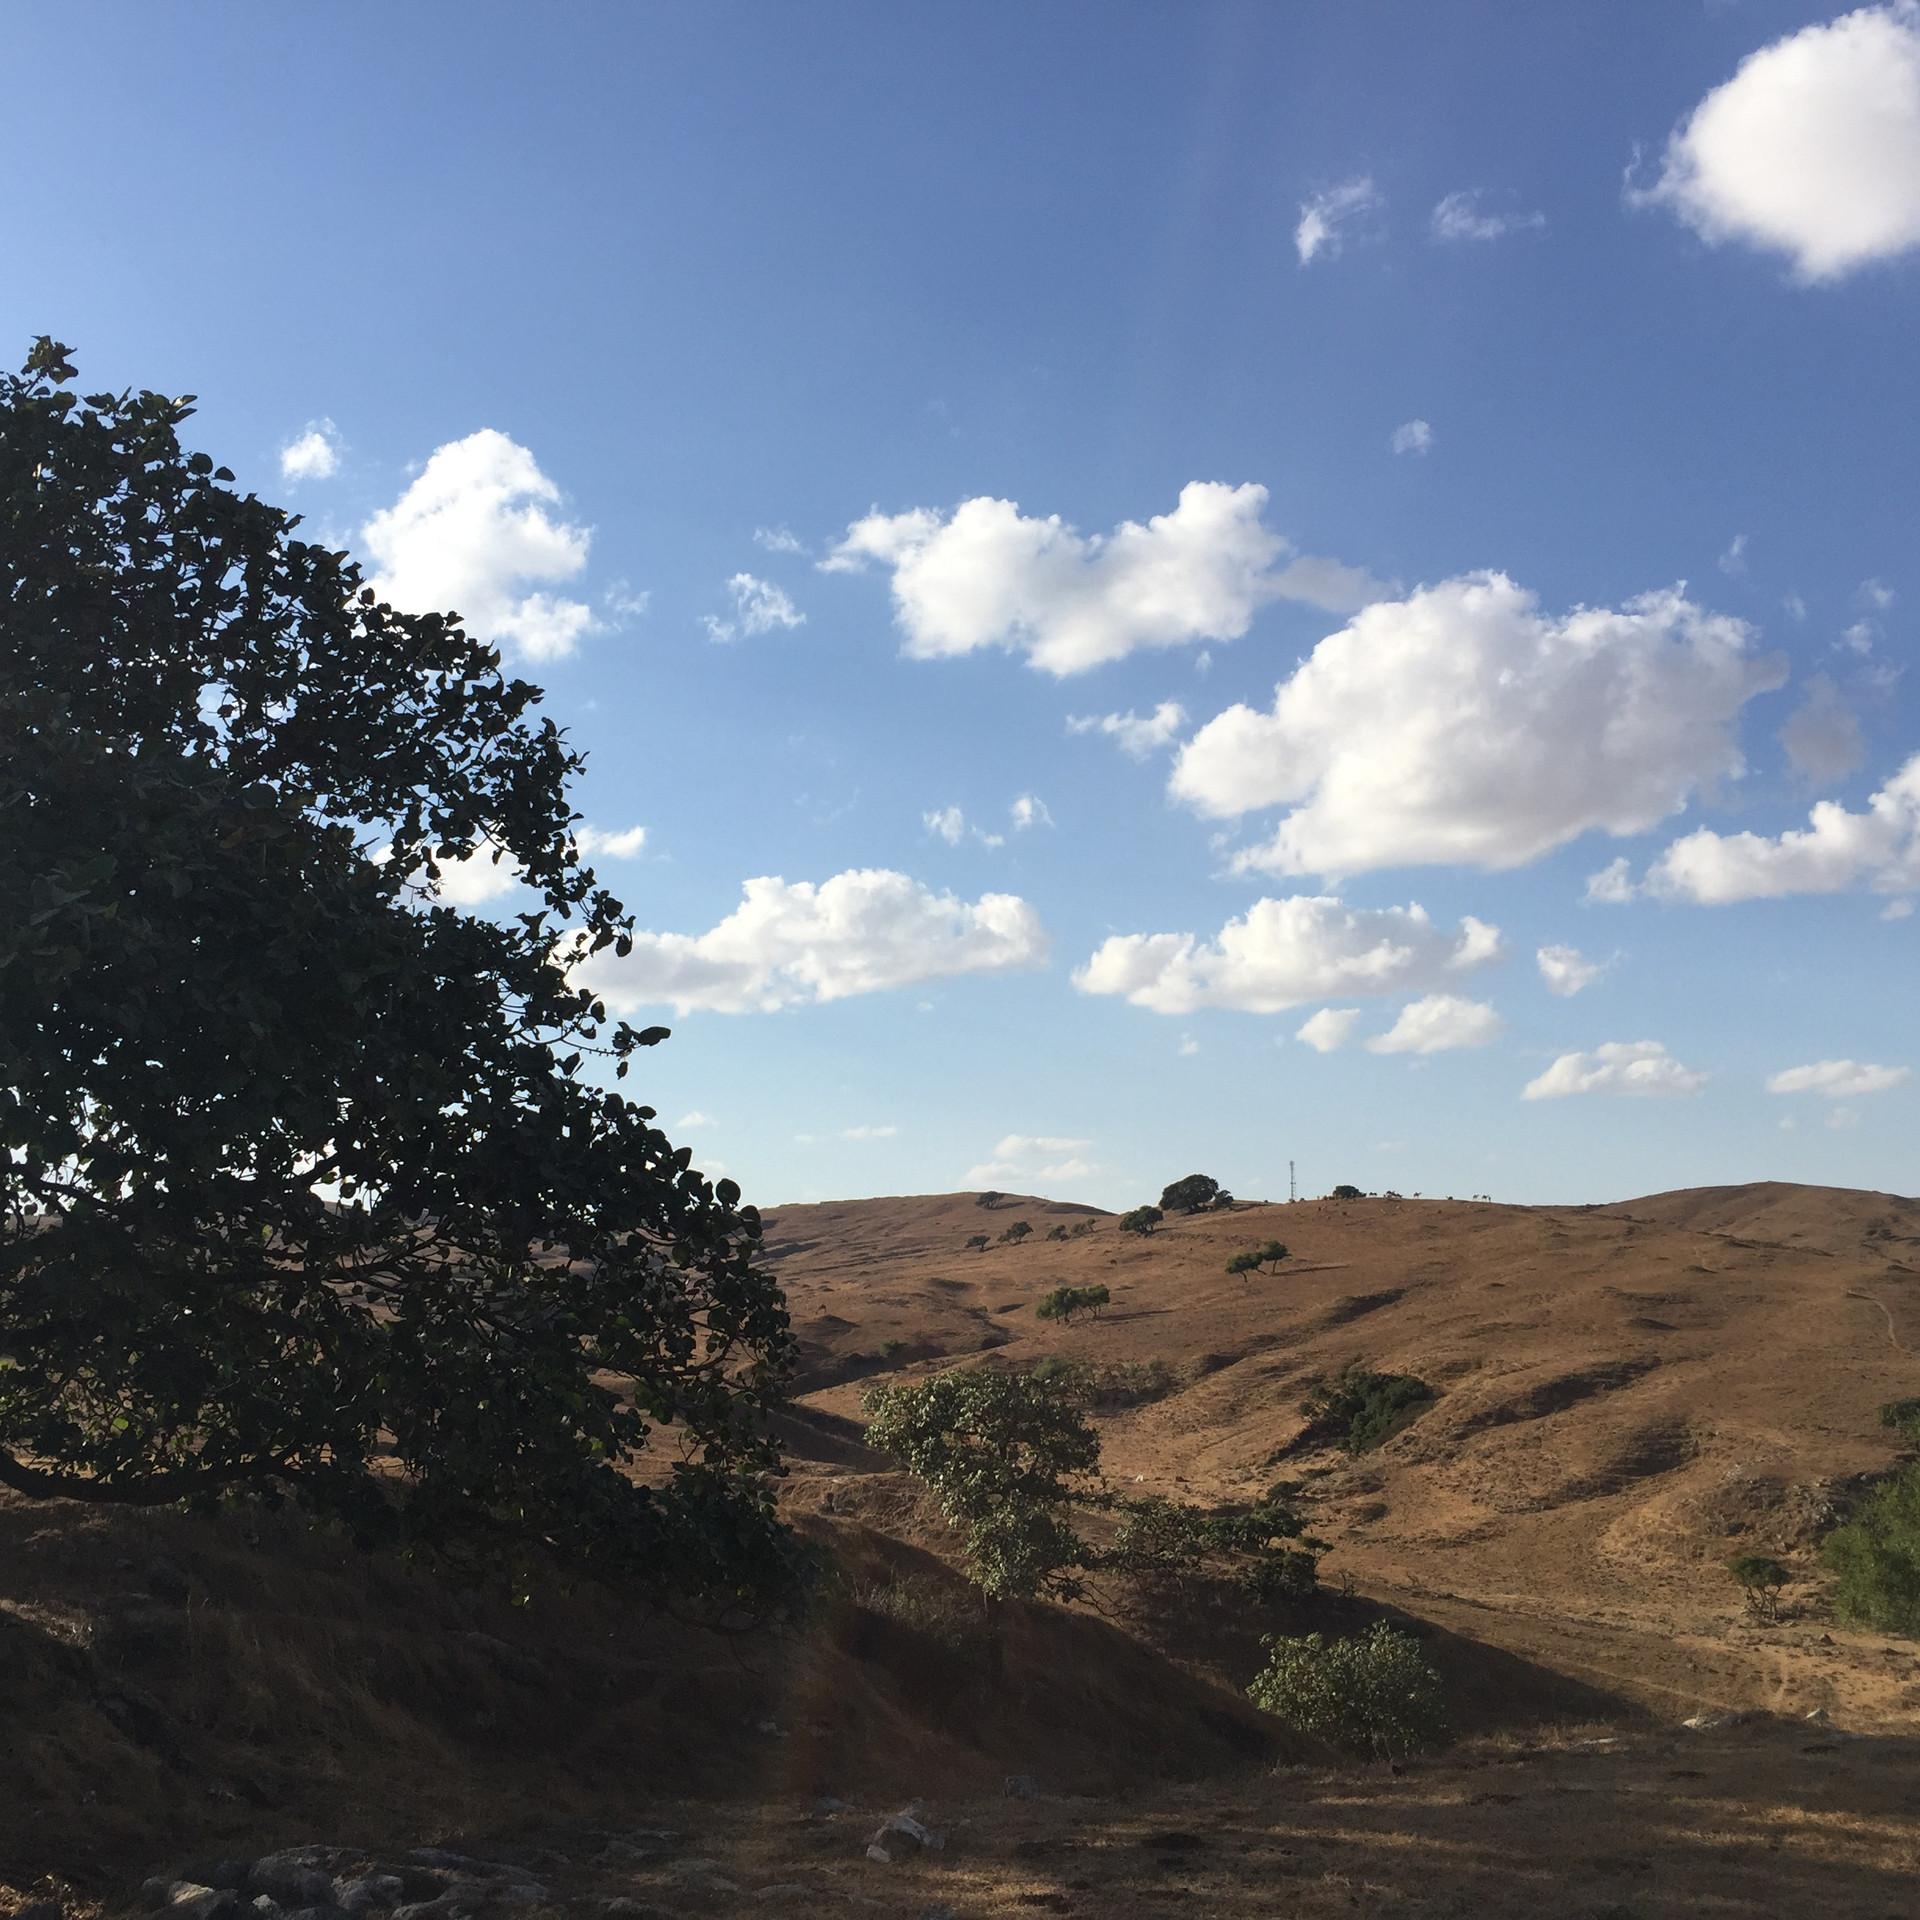 The Qara mountain range